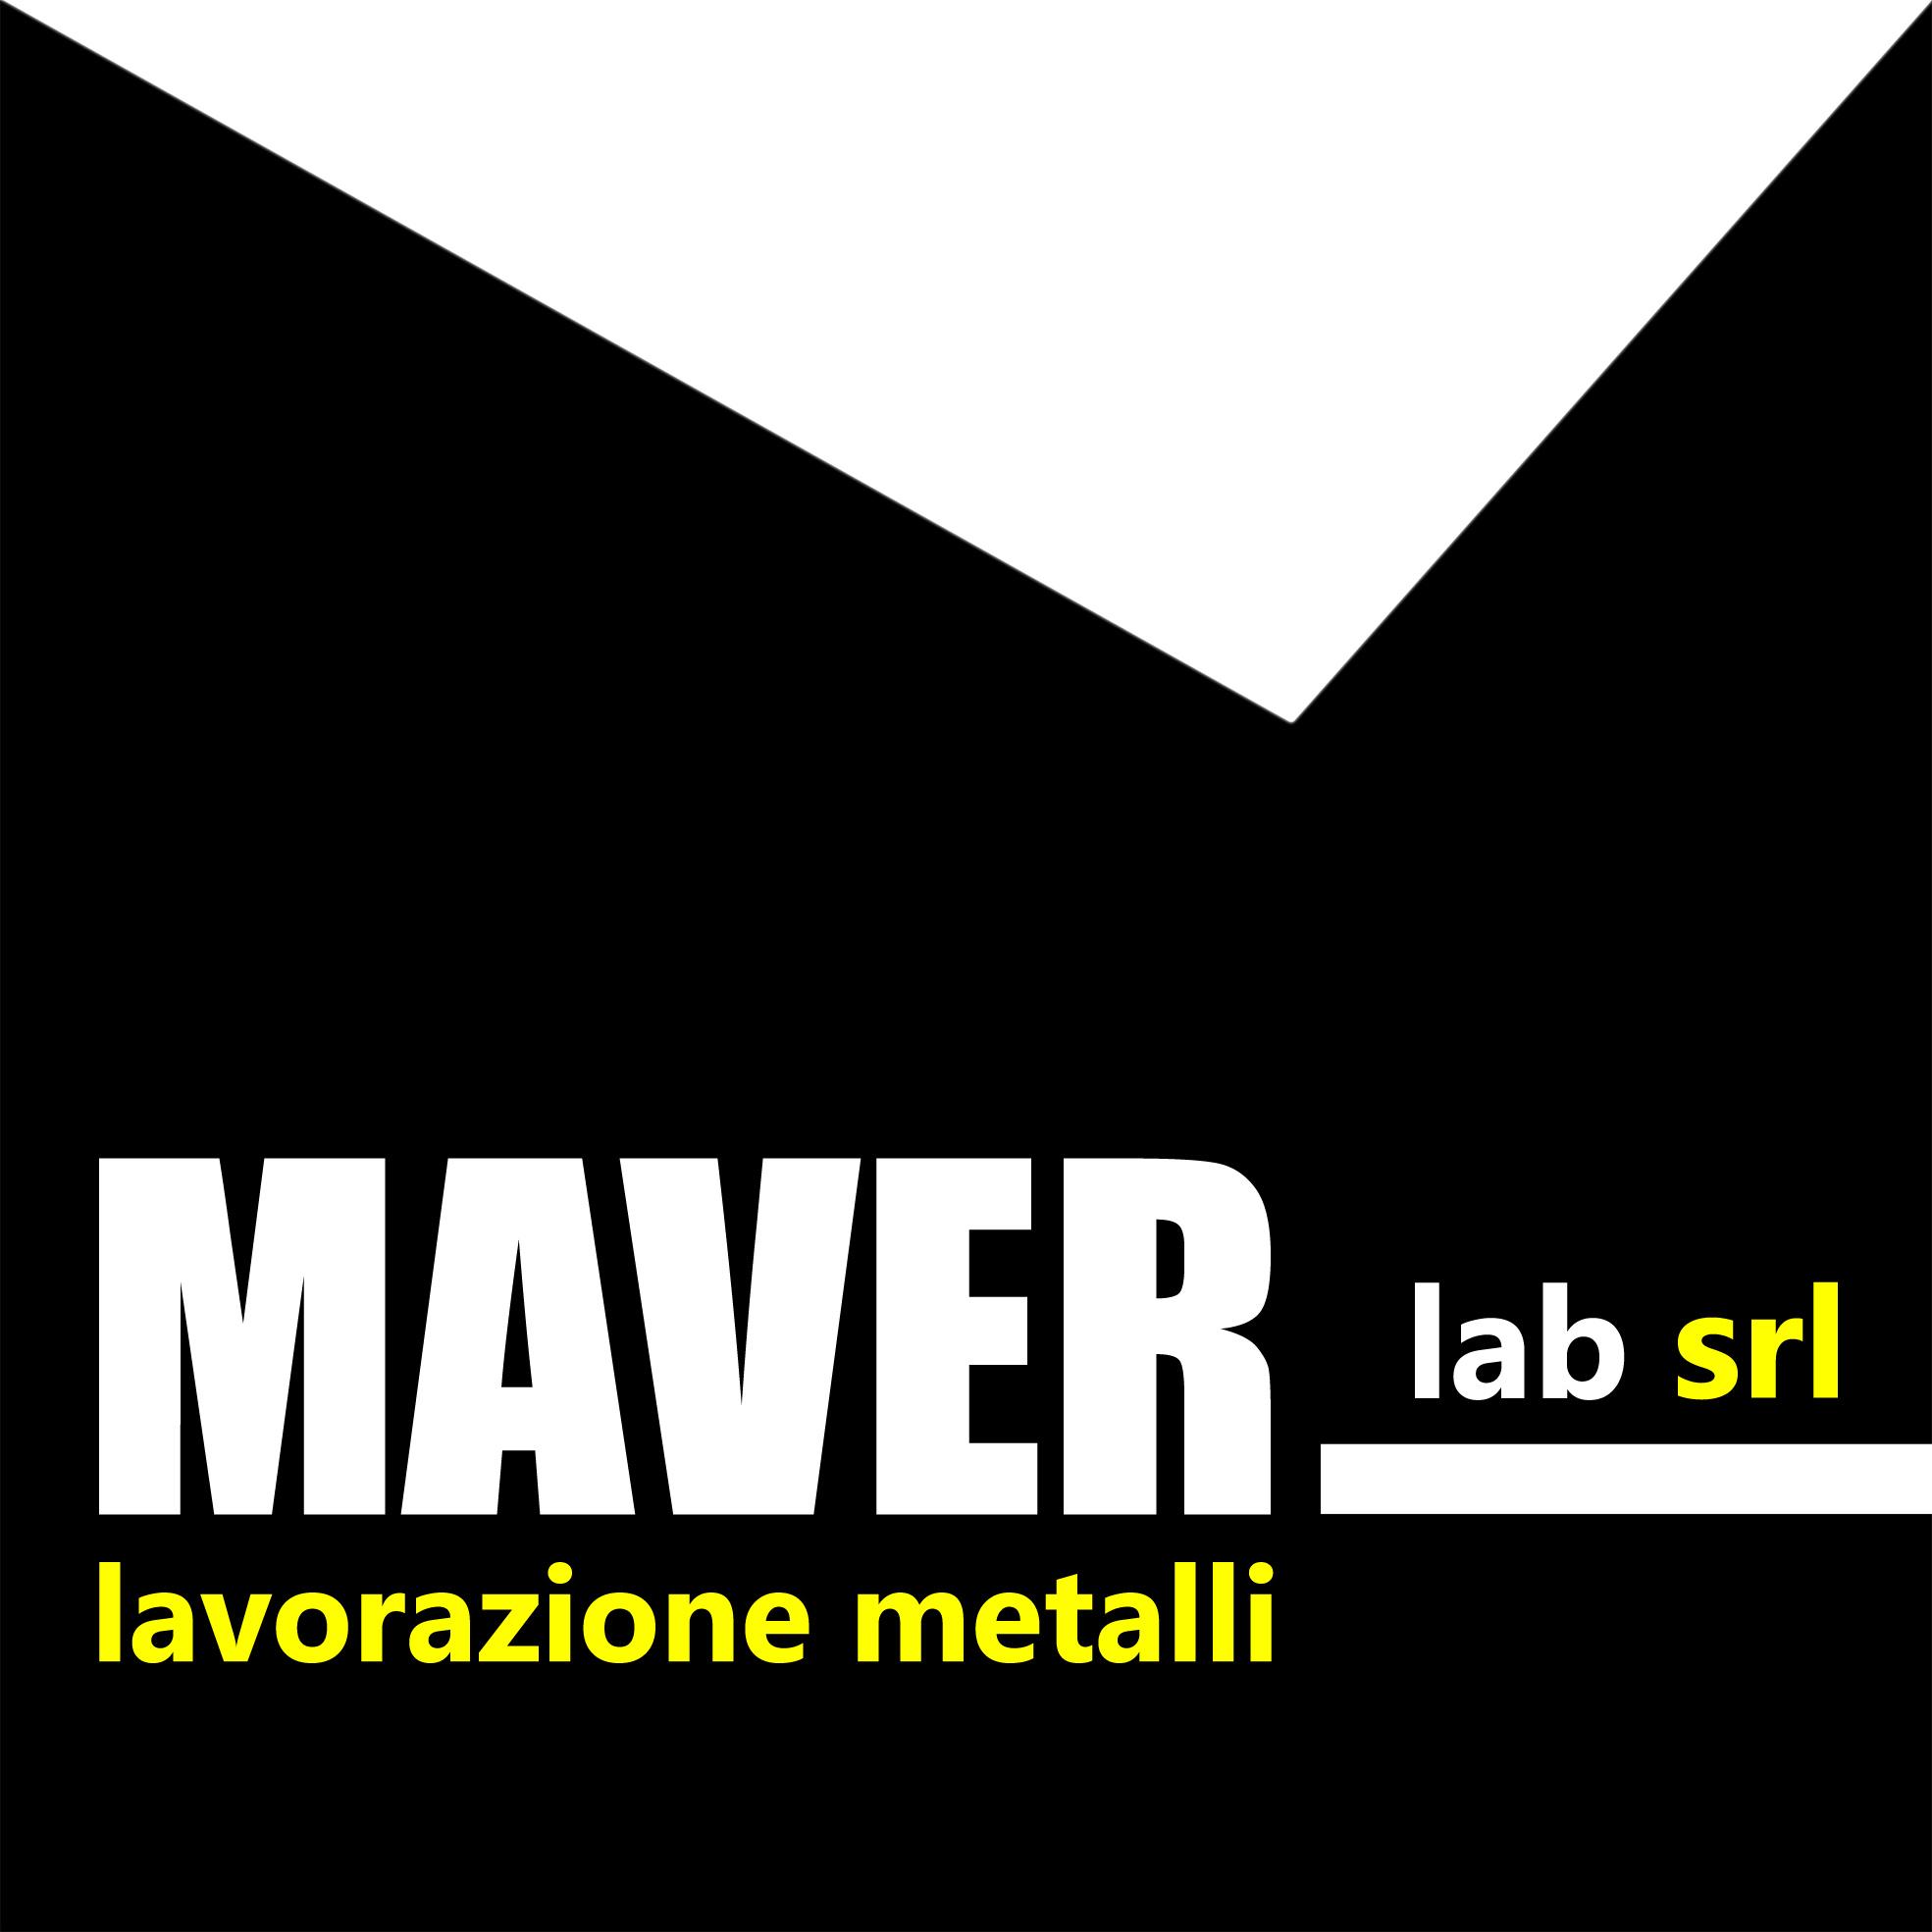 MaverLab Srl